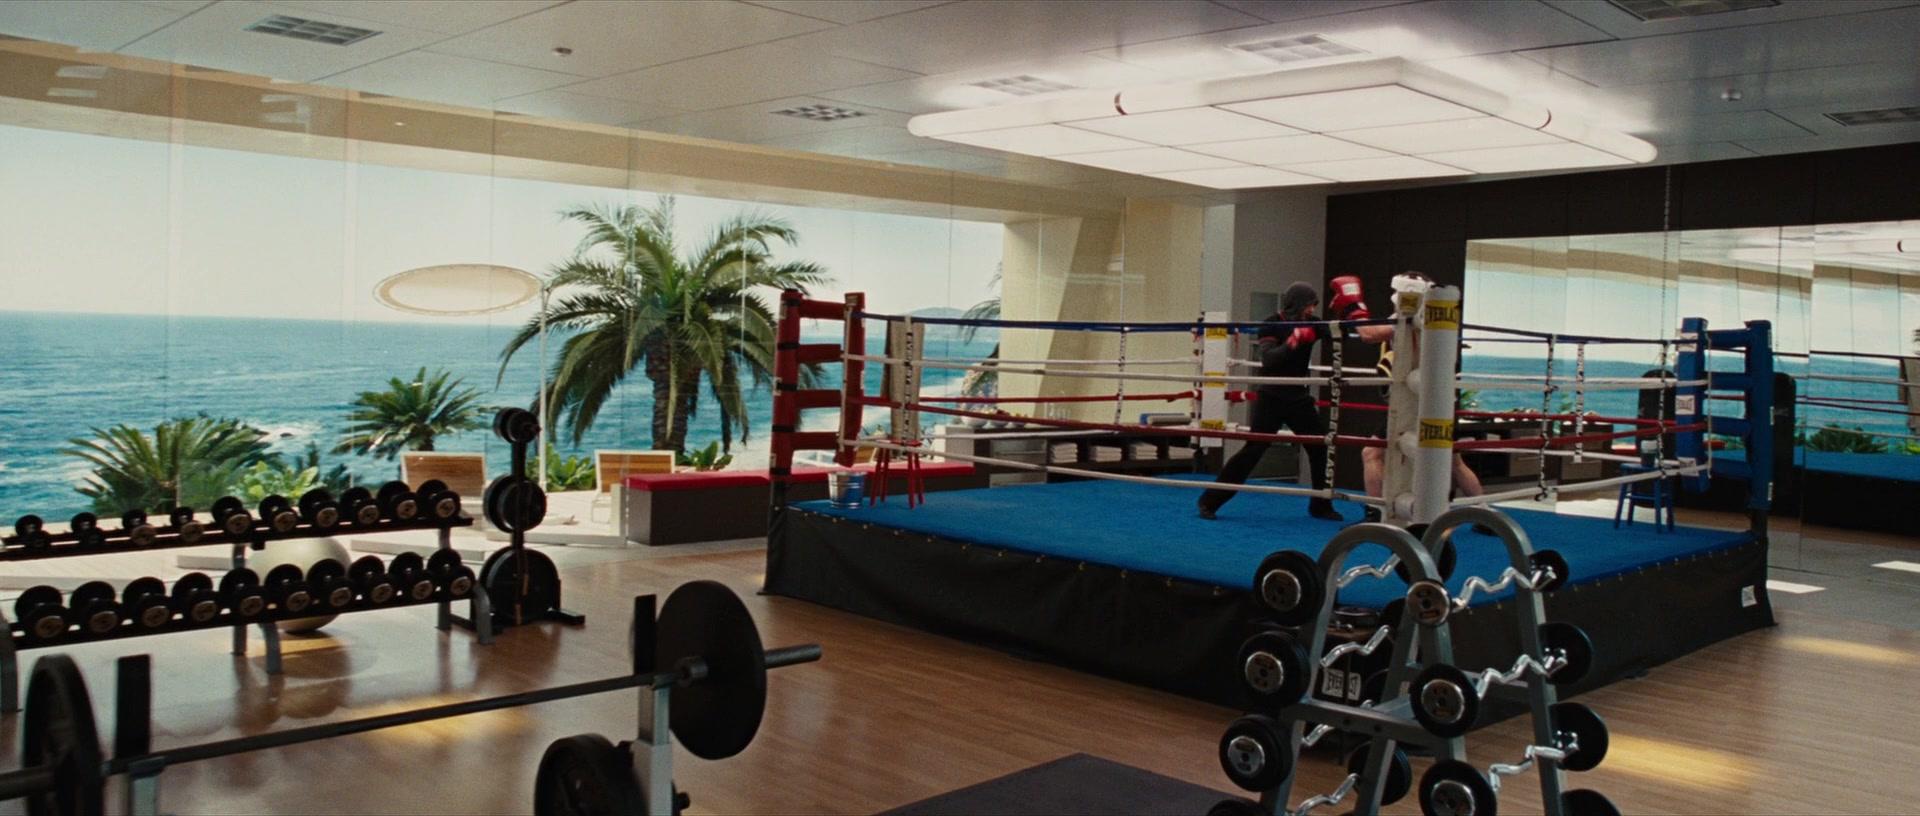 Iron Man House Interior. Gym Tony Stark s Mansion  Marvel Cinematic Universe Wiki FANDOM